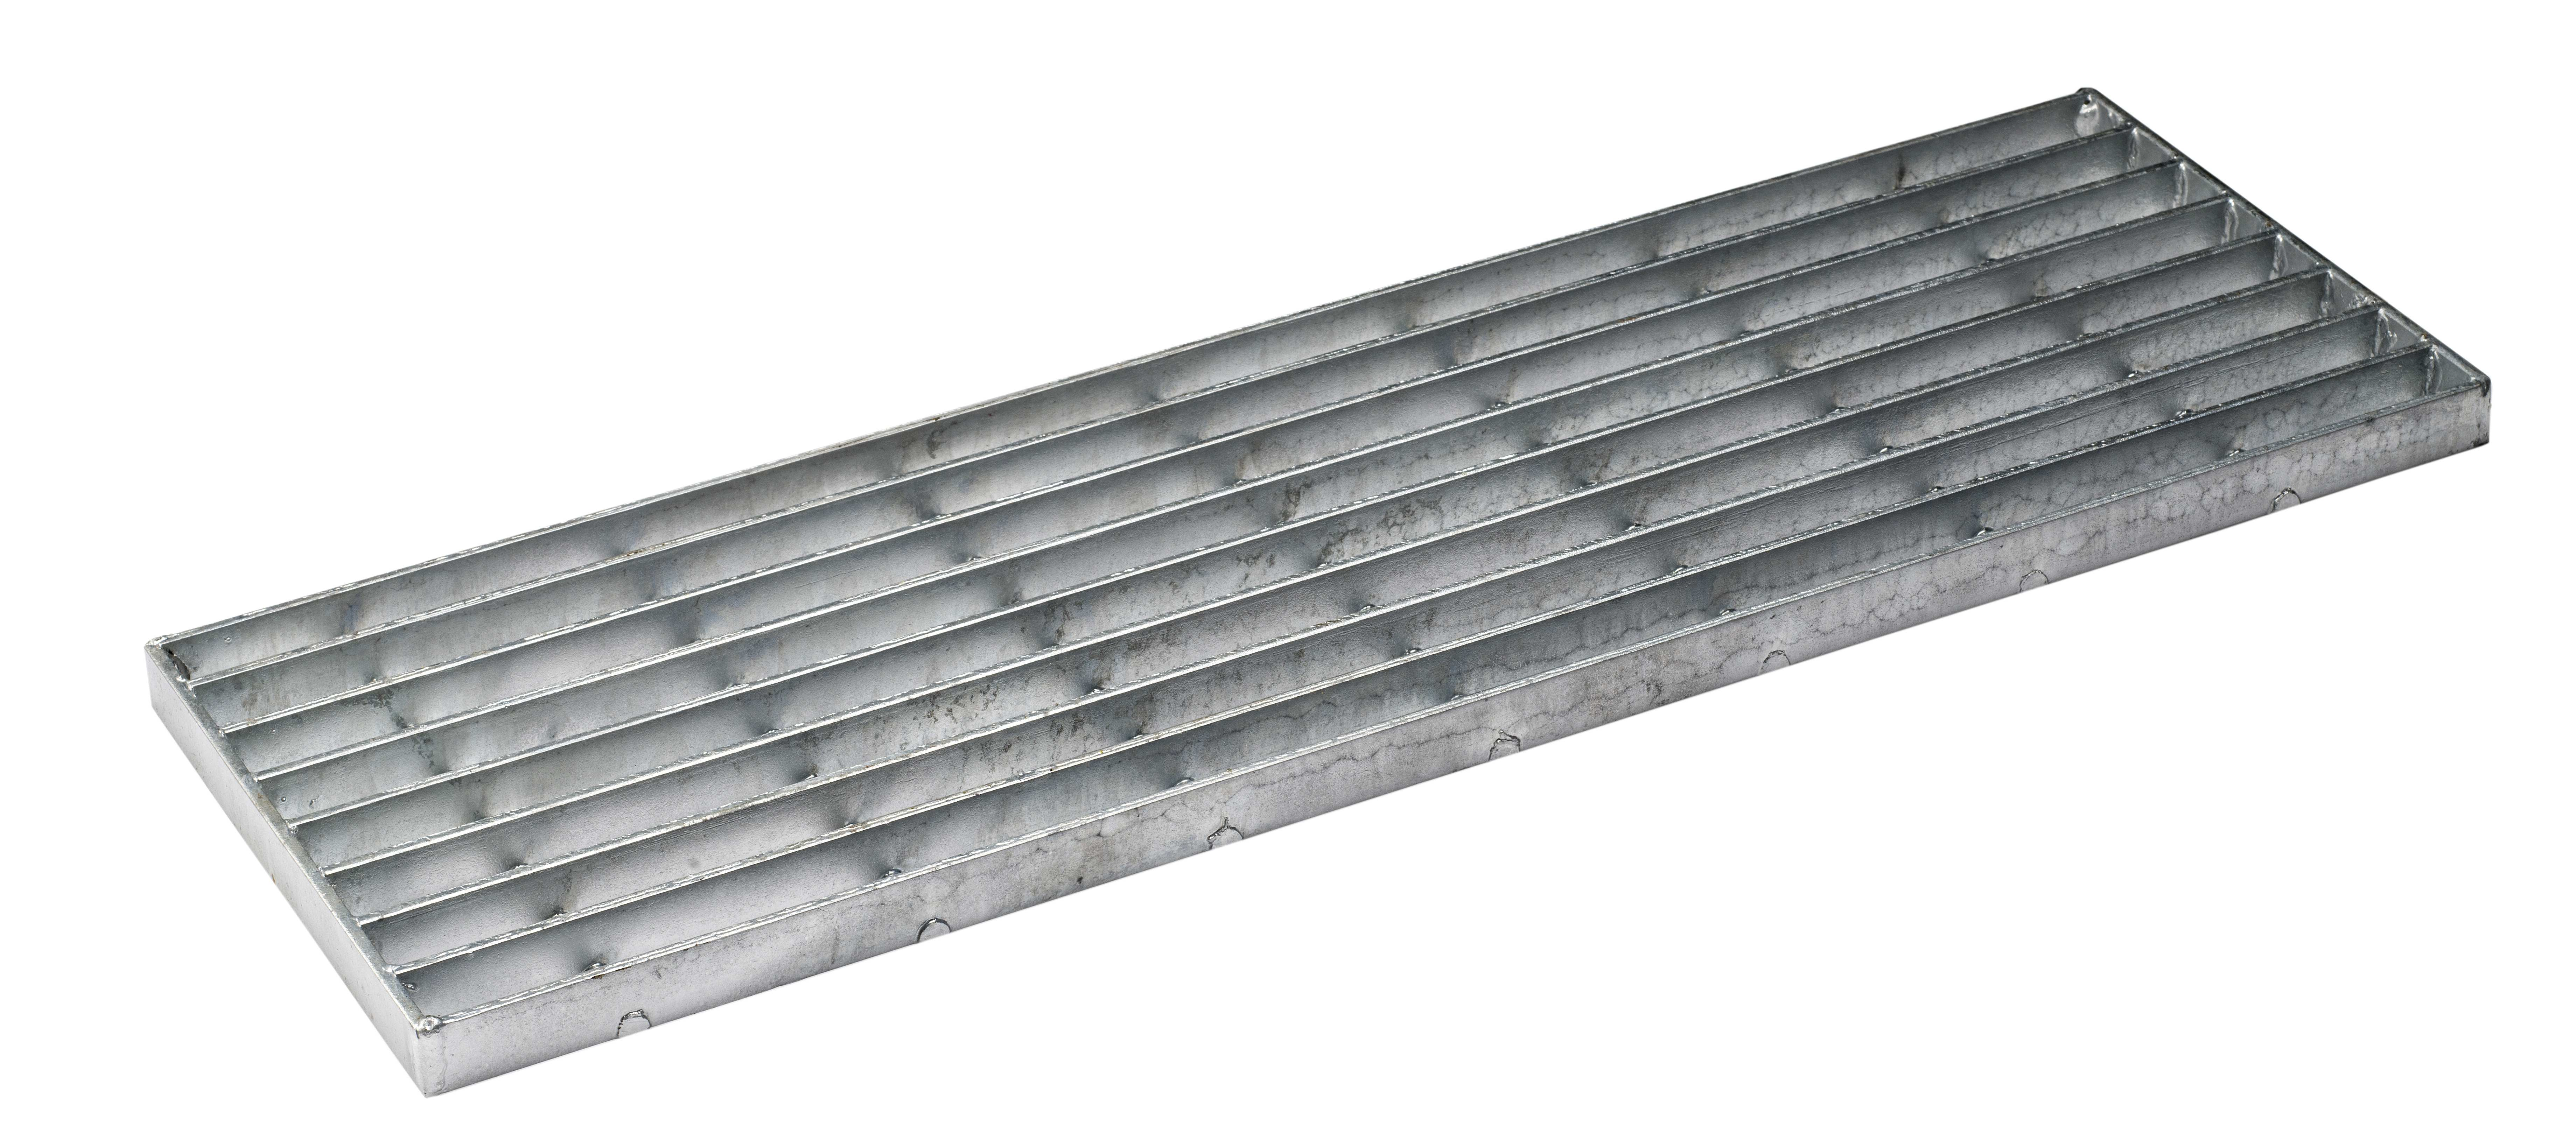 steel T1 tread